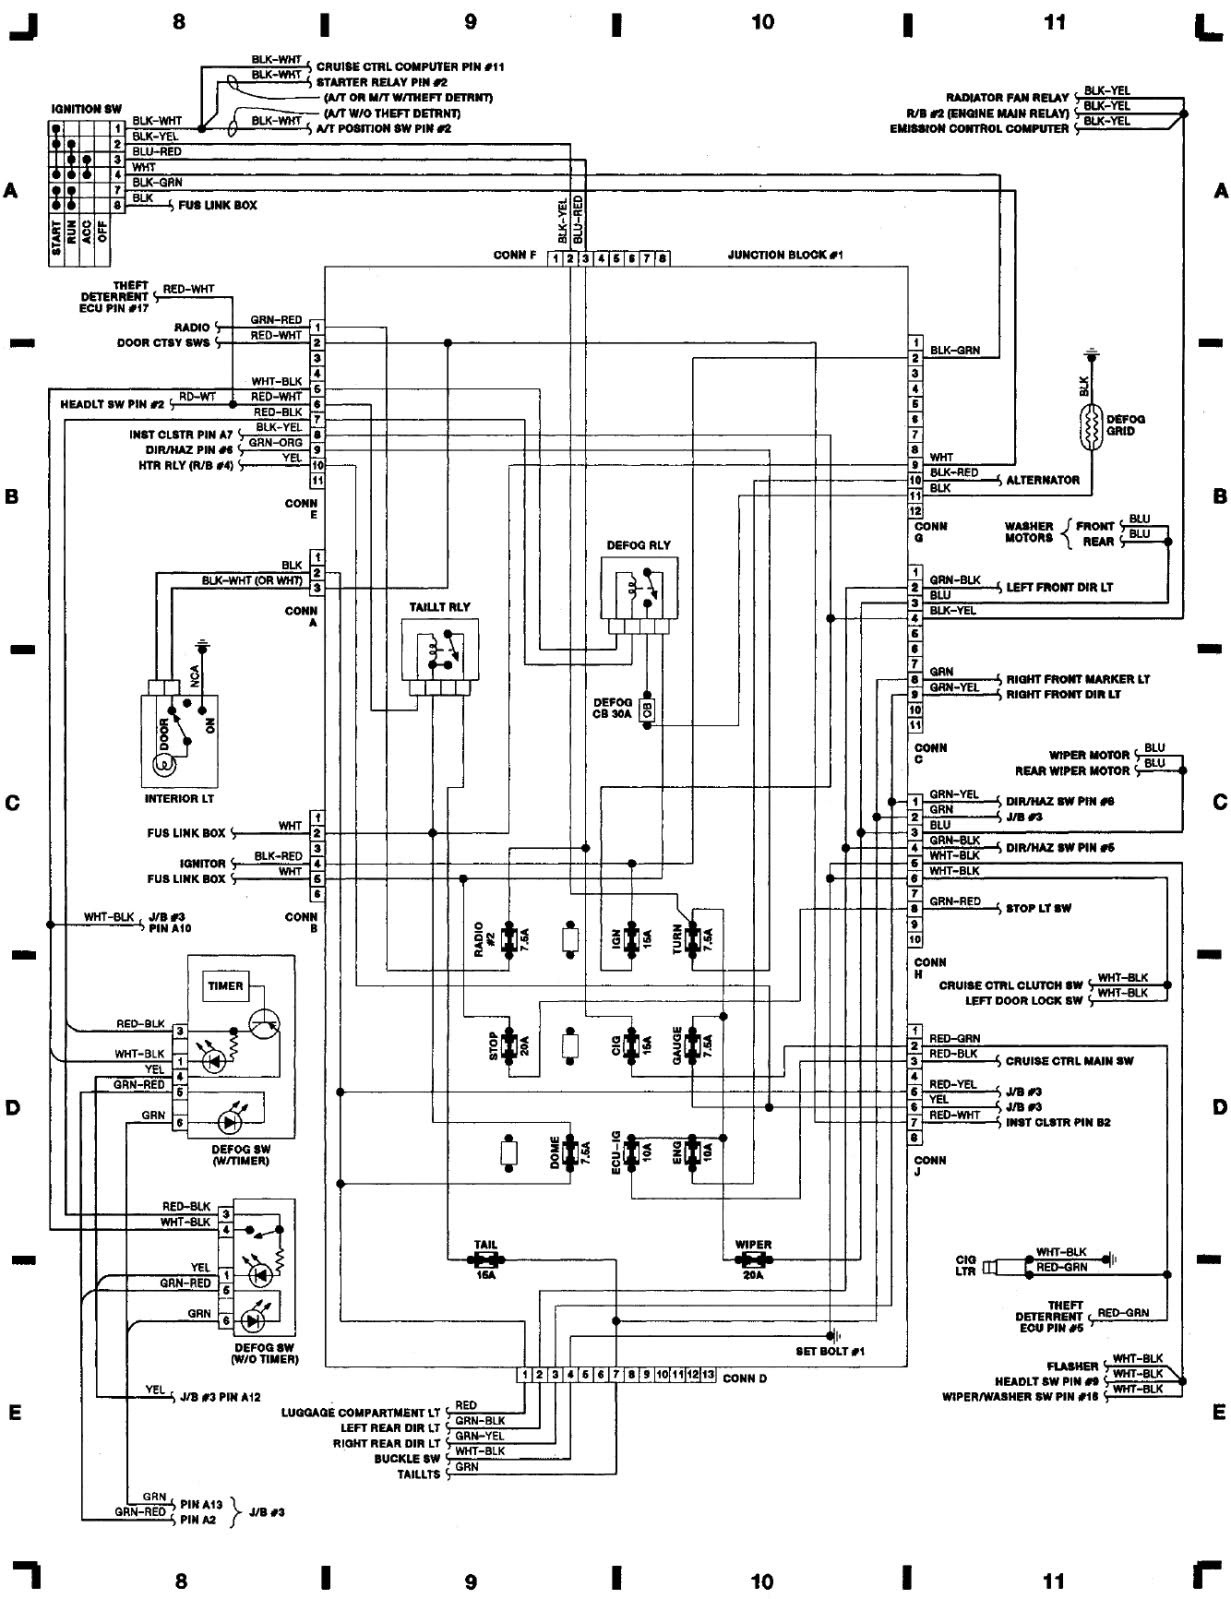 Cw 6641  82 Corolla Wiring Diagram Free Download Wiring